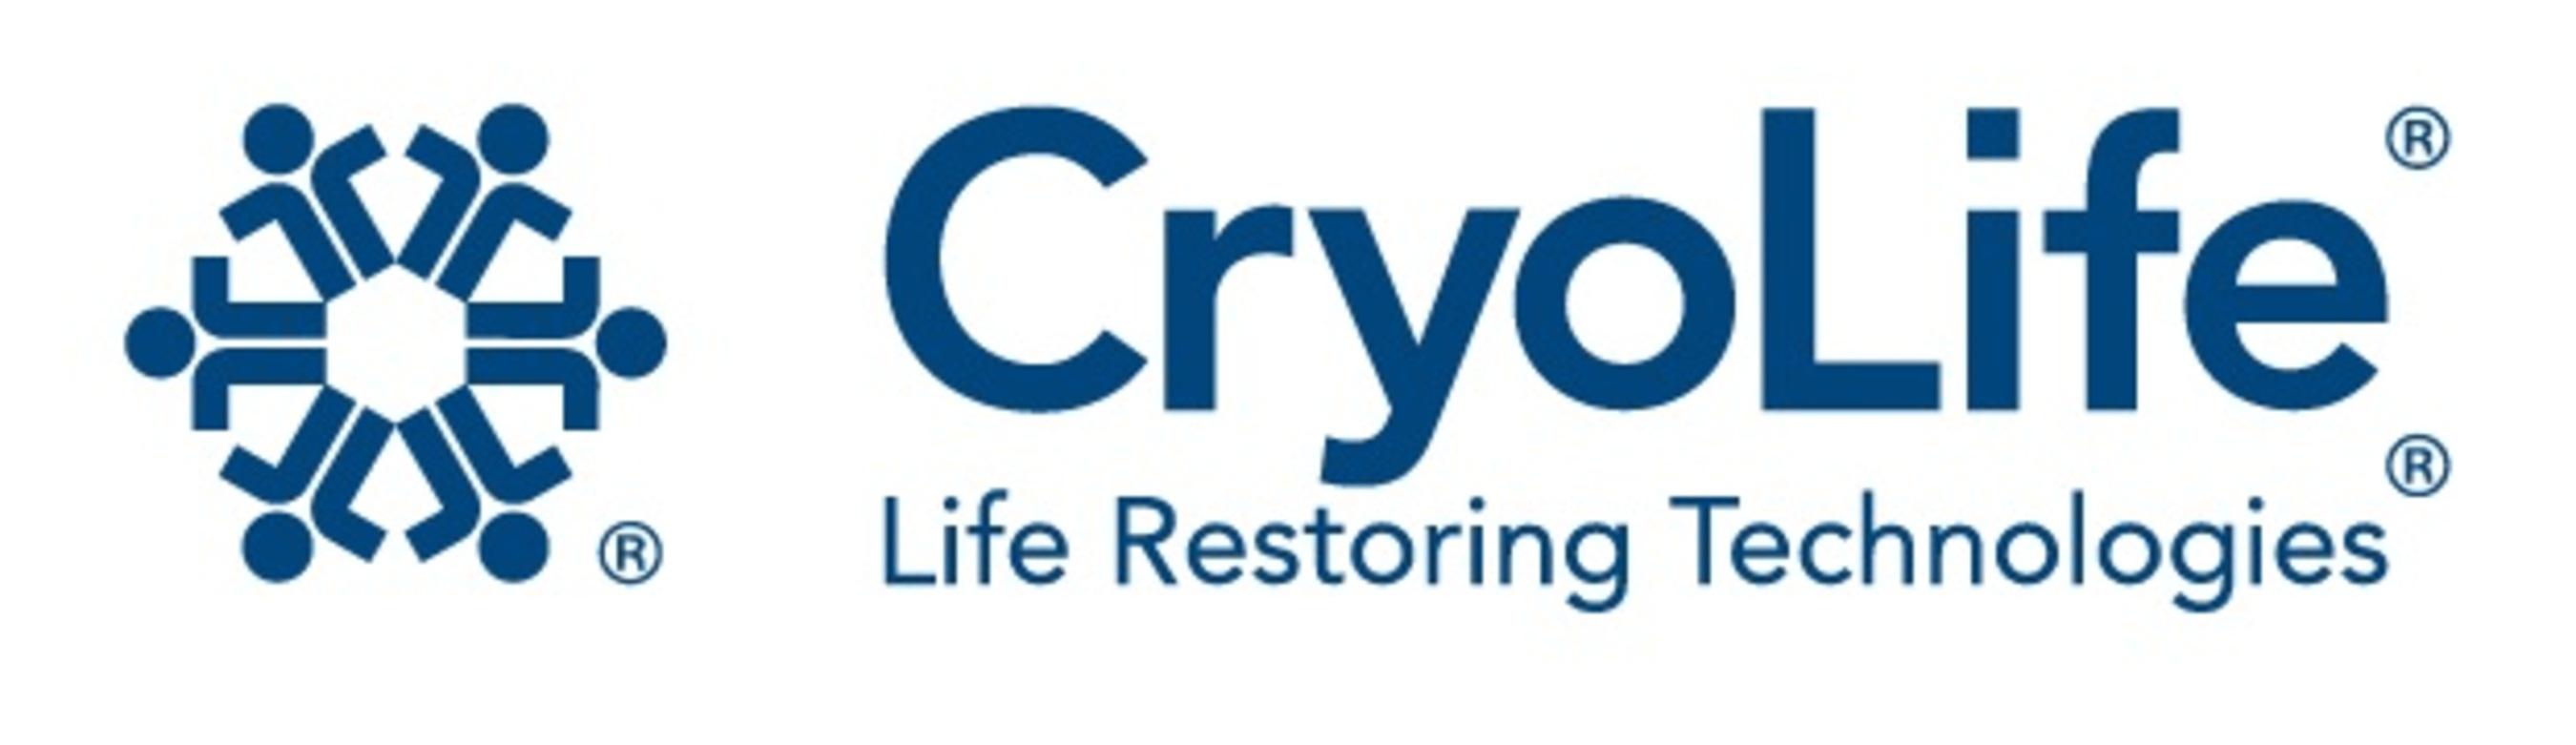 Cryolife logo.